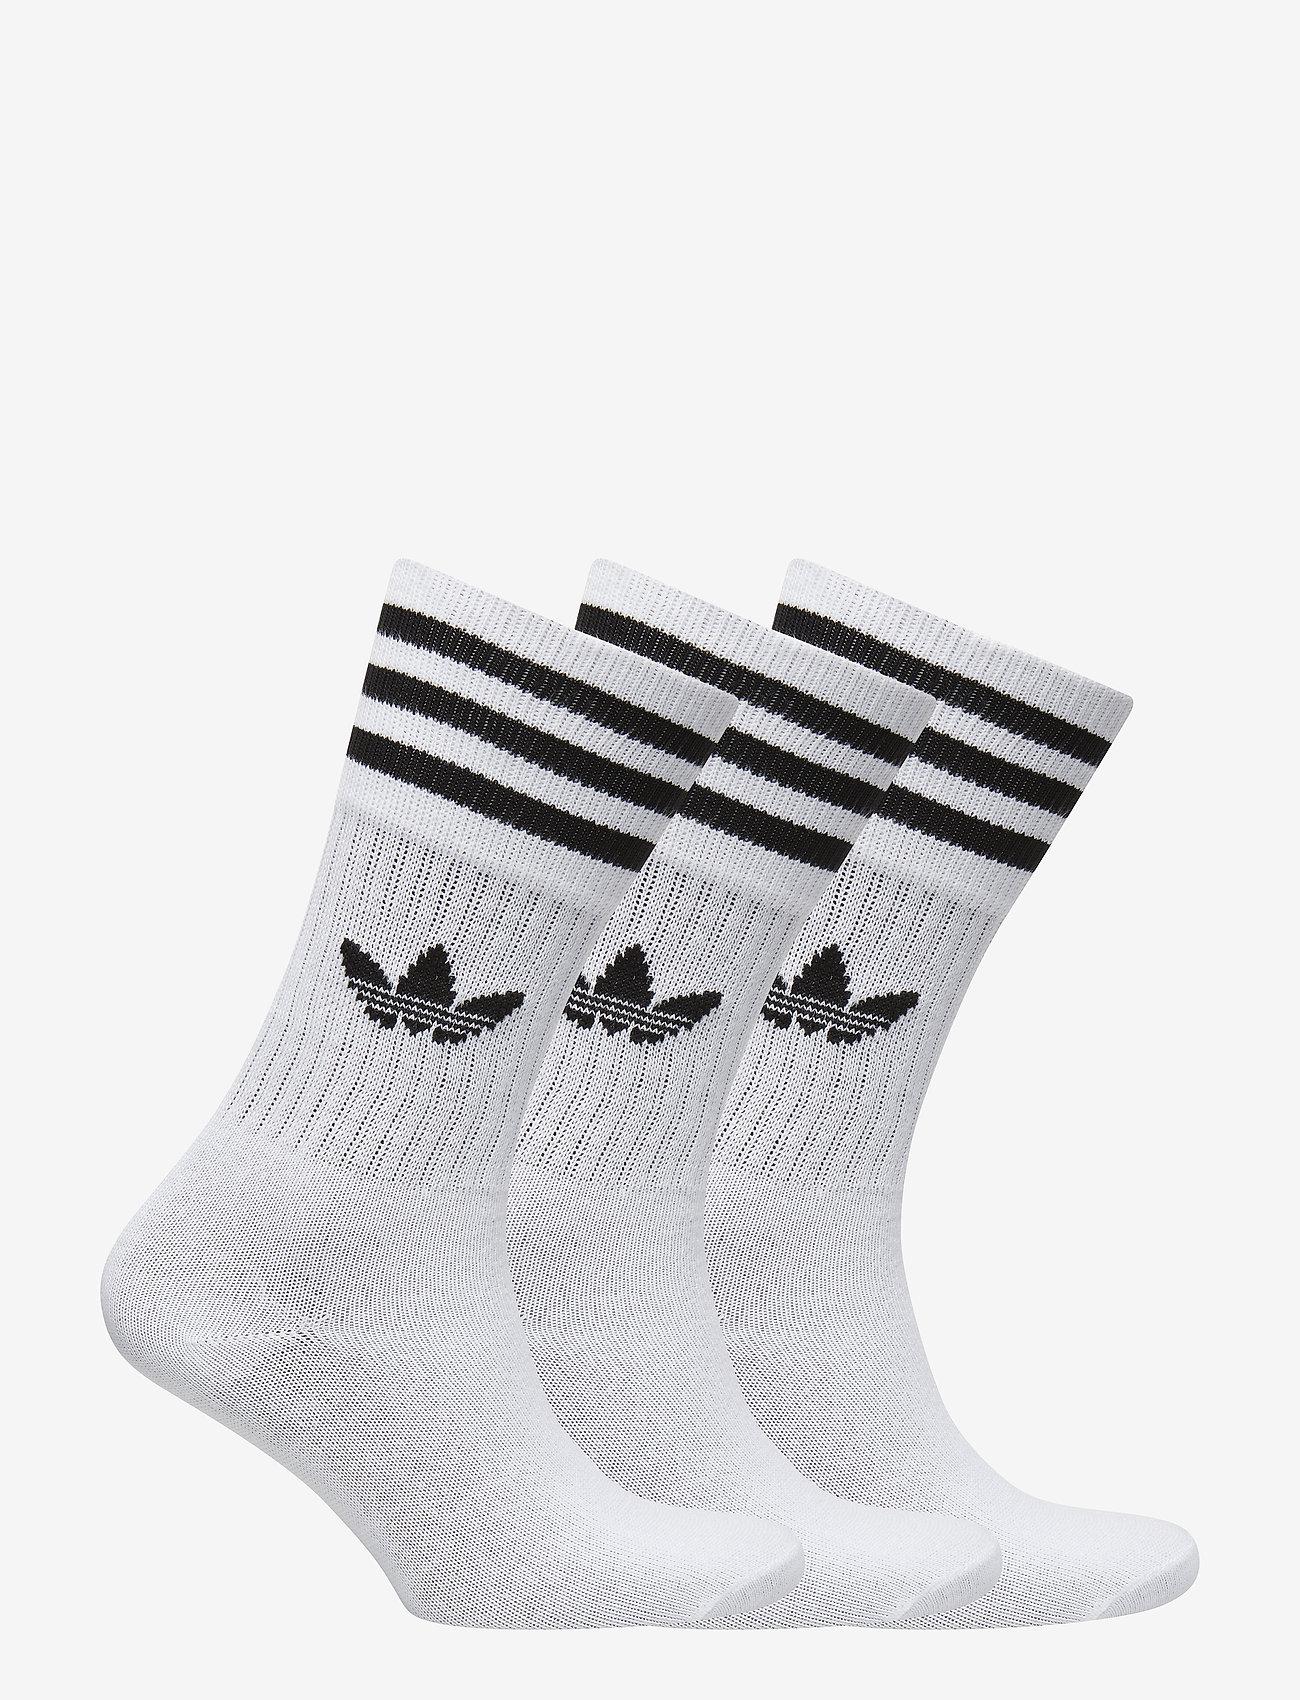 Solid Crew Sock (White/black) - adidas Originals FzVigy